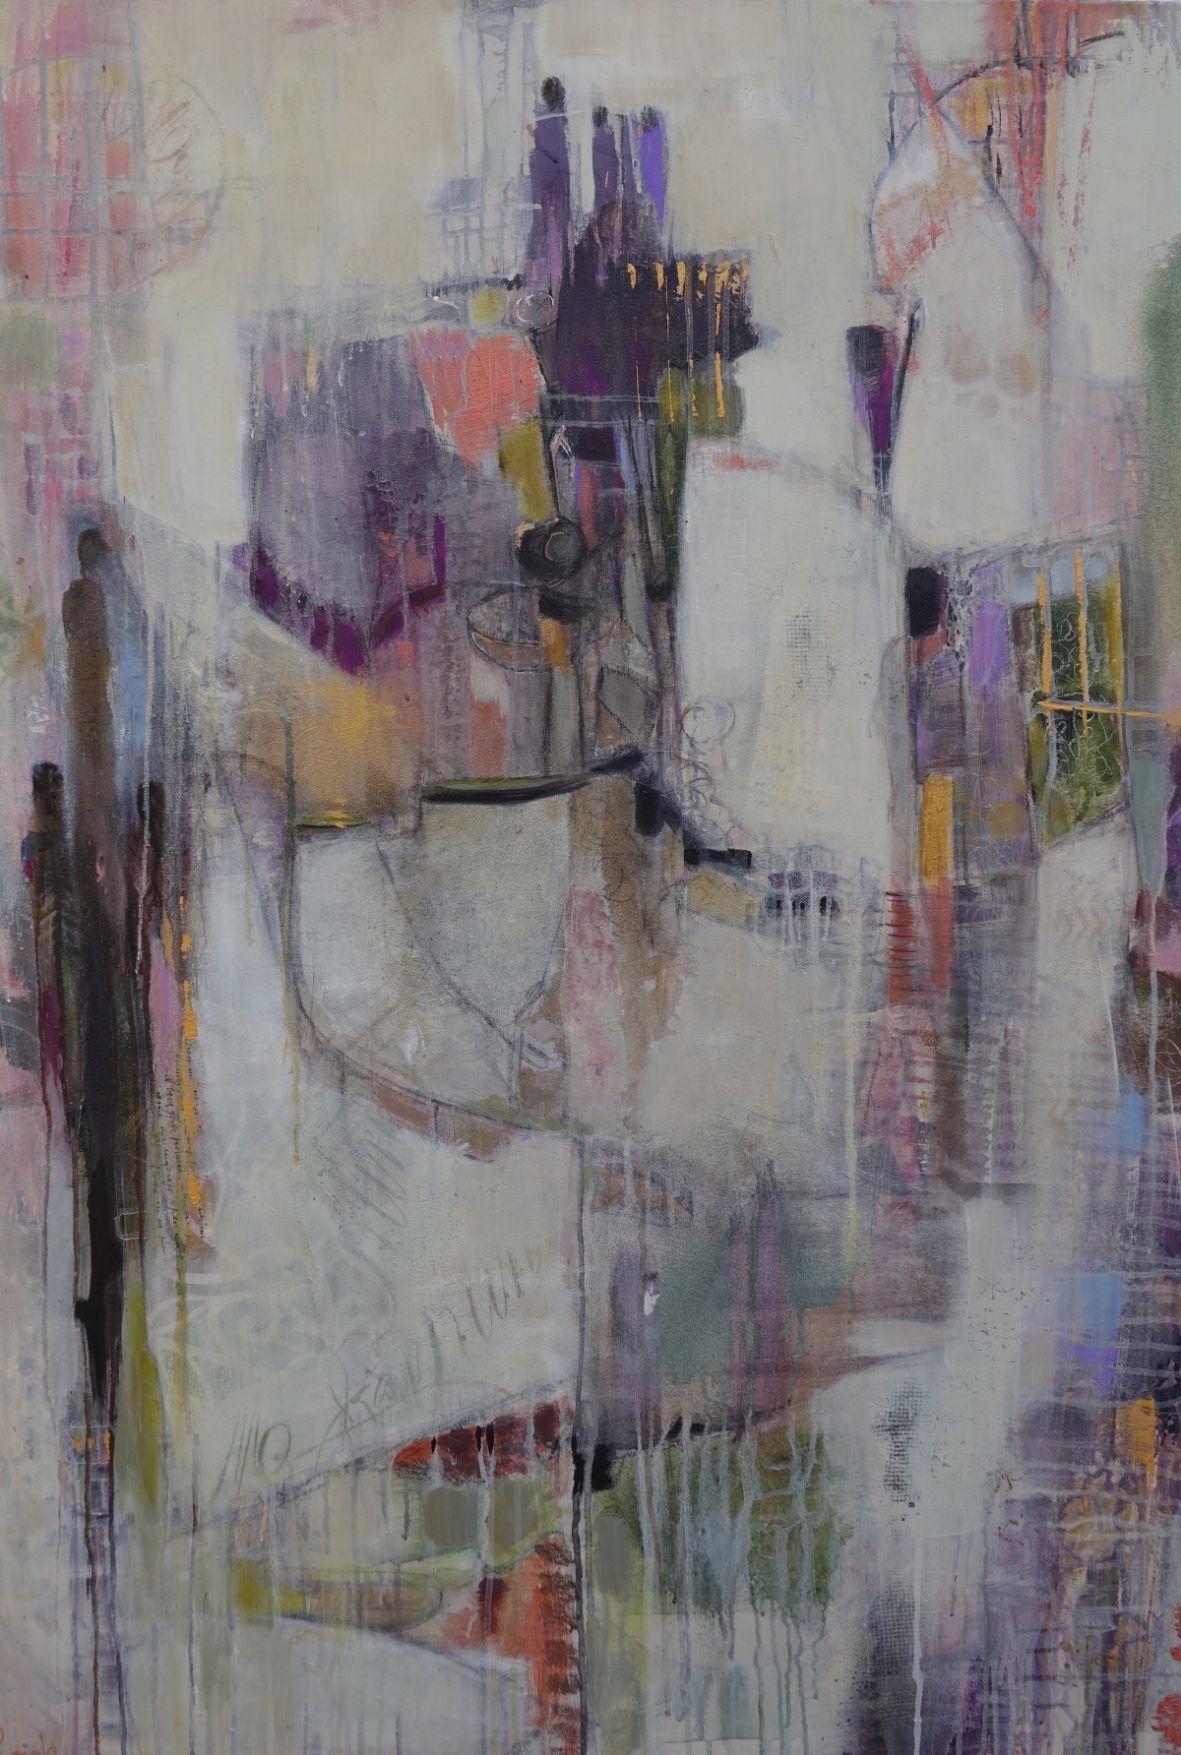 Art exhibit of works by Marcia Reich